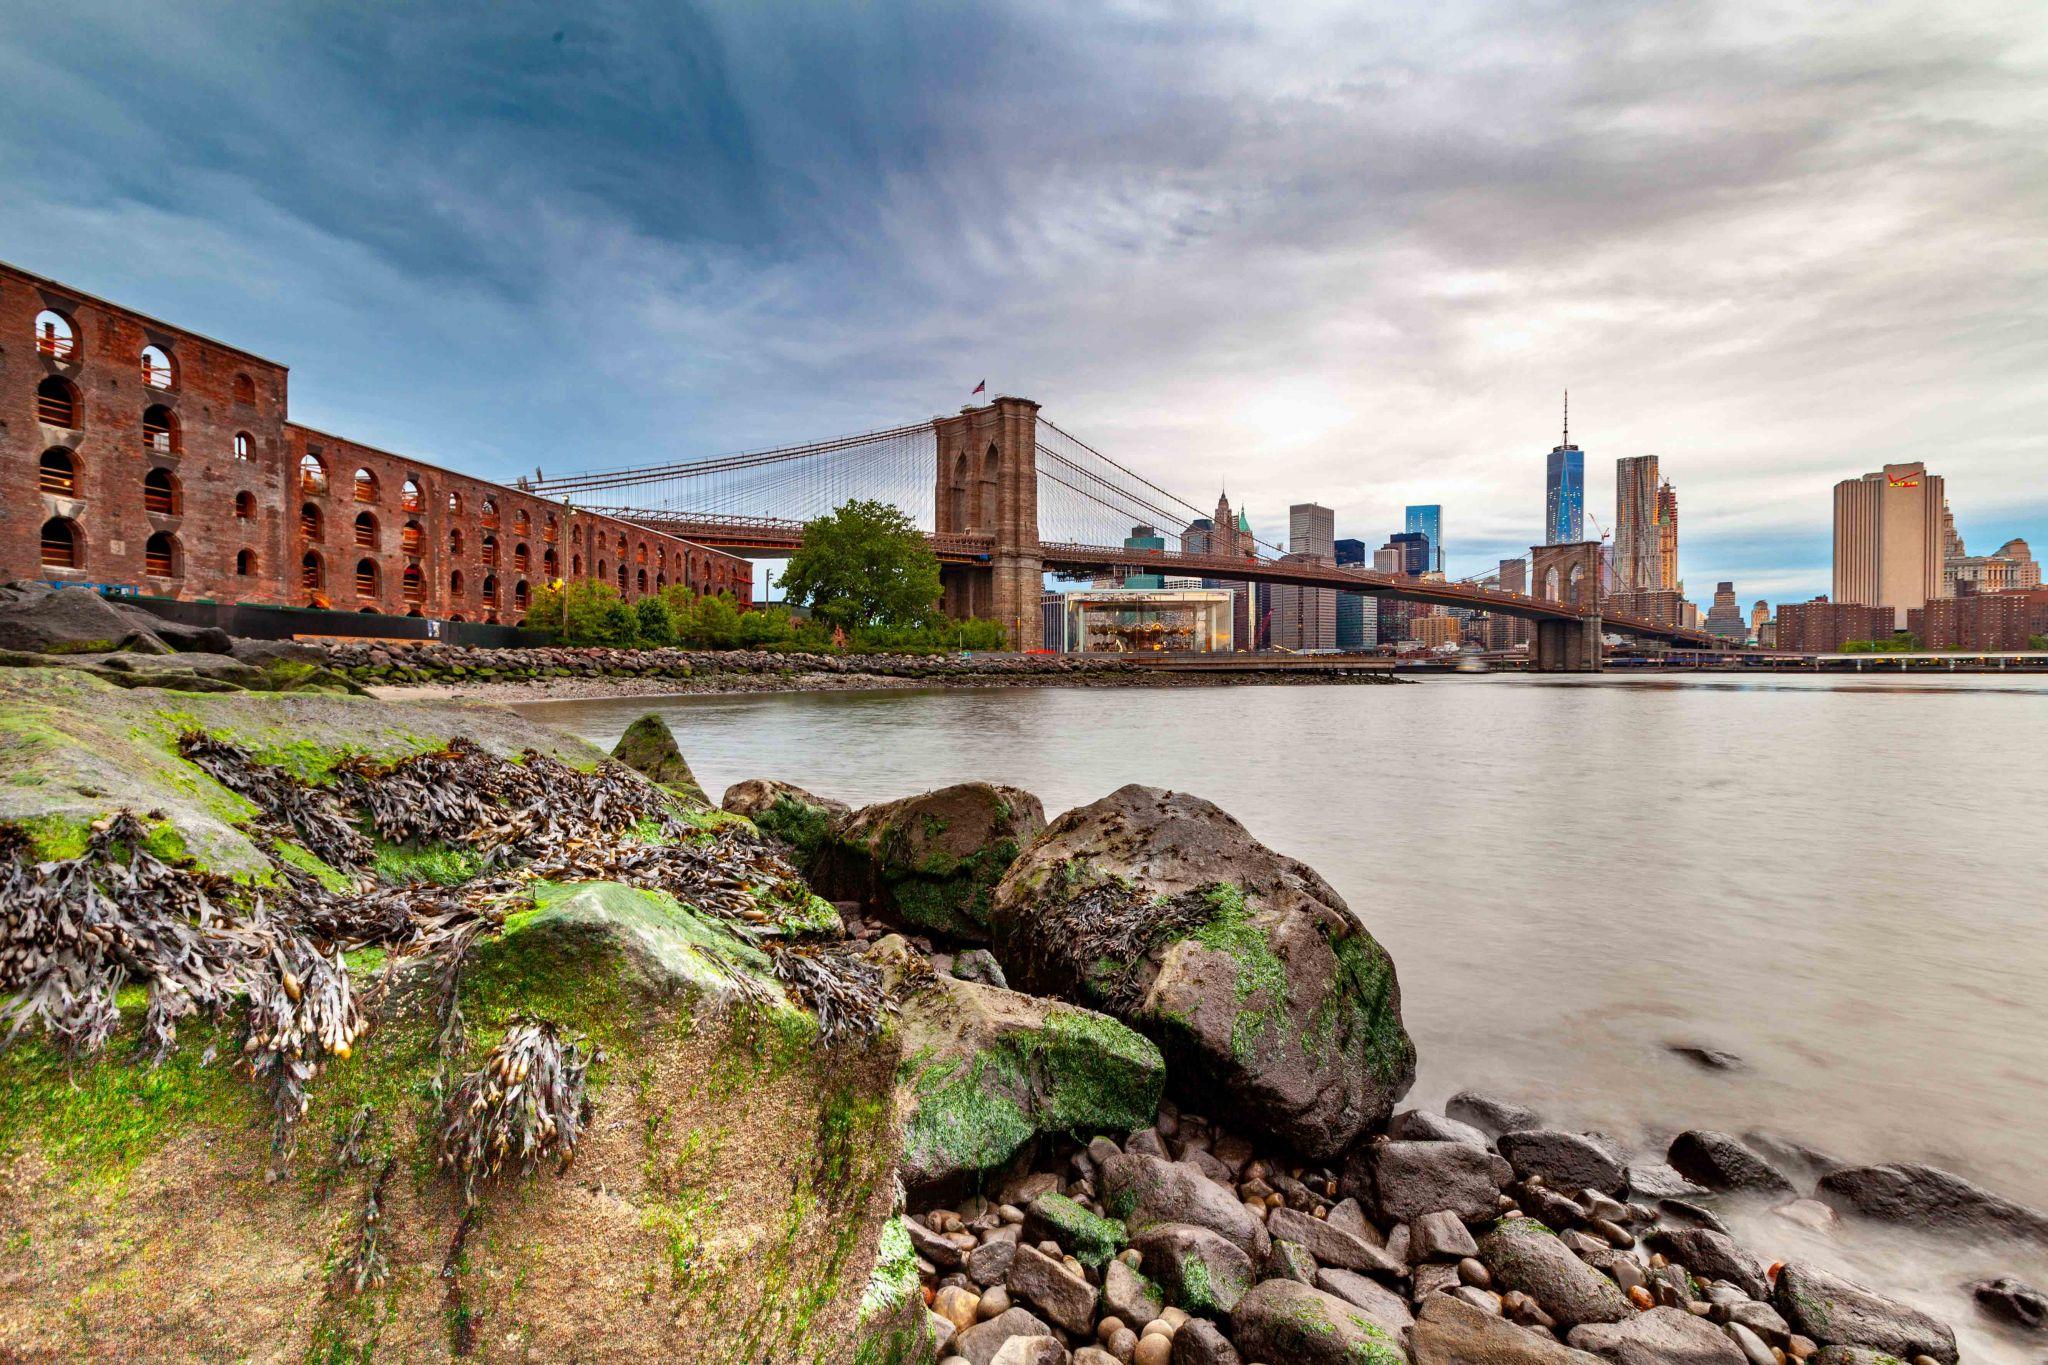 Shoreline Brooklyn Bridge Brooklyn, USA